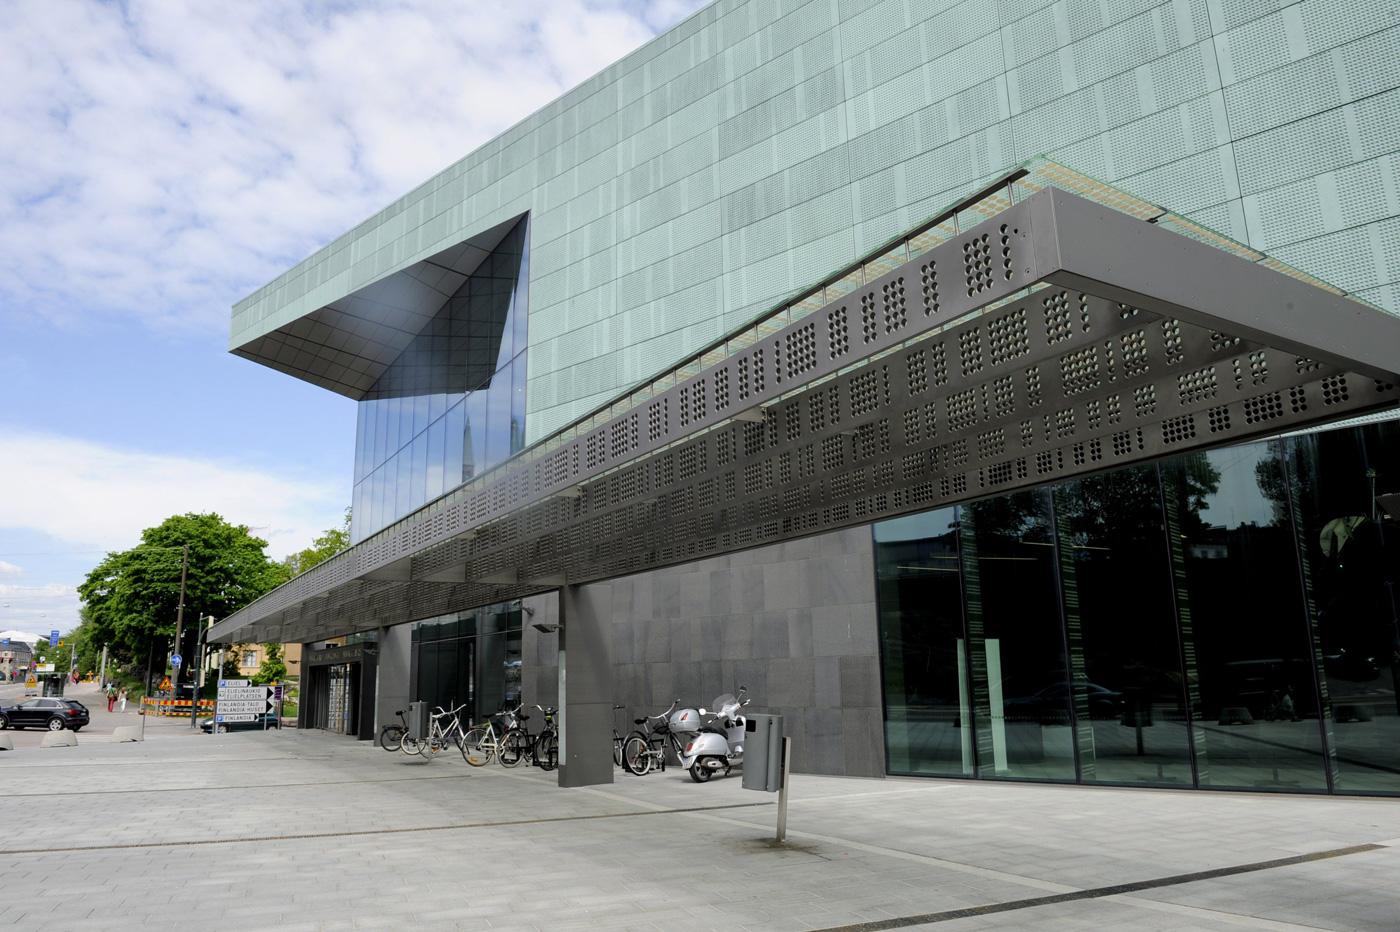 Symposium VIII – 2010, Helsinki, Finland